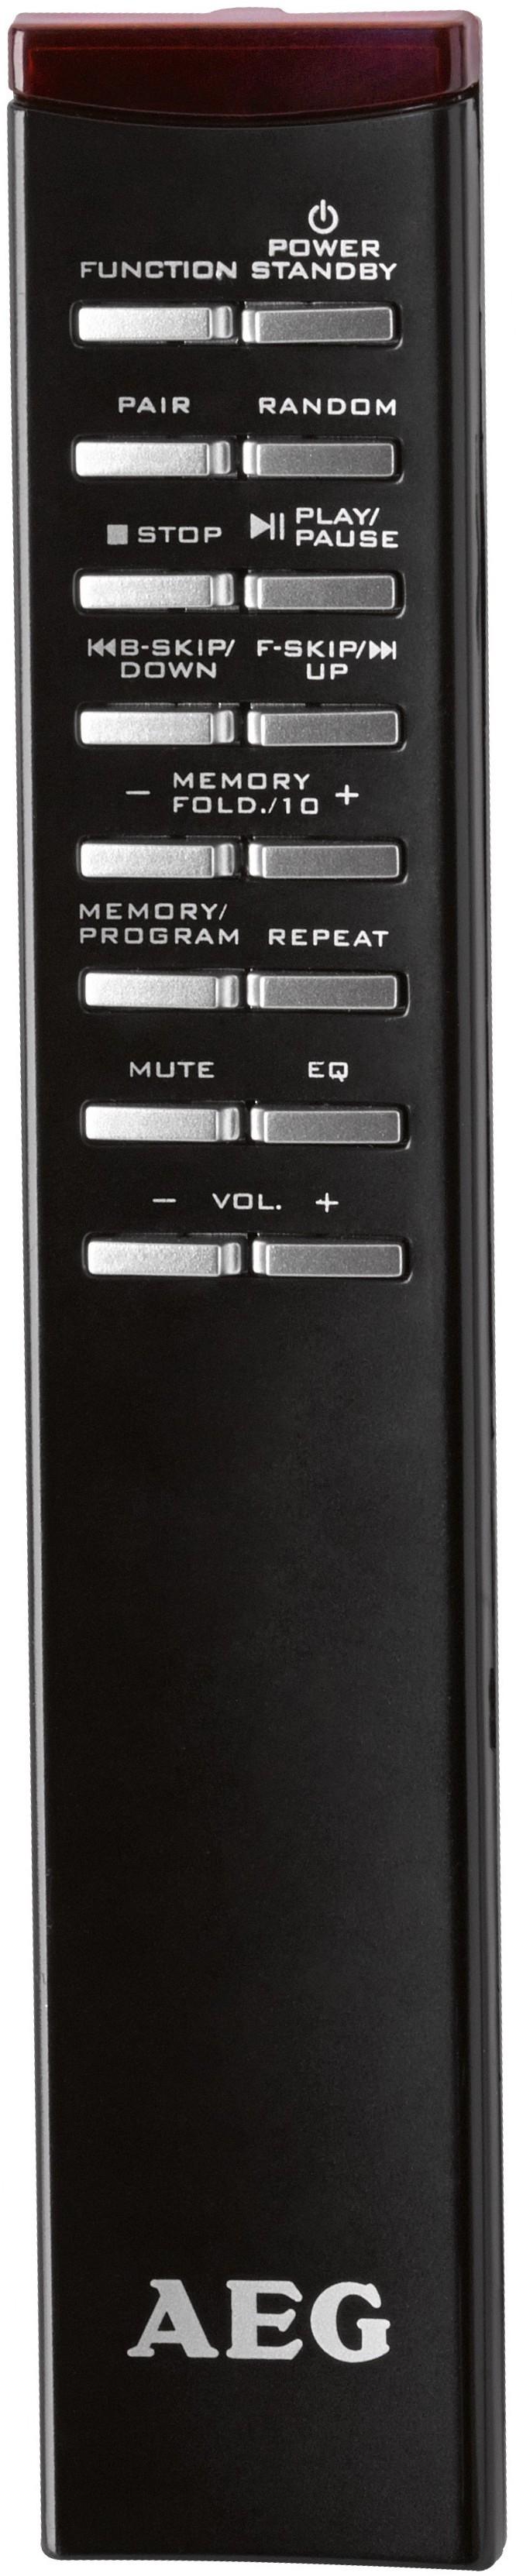 AEG BSS 4803 Speaker.jpg